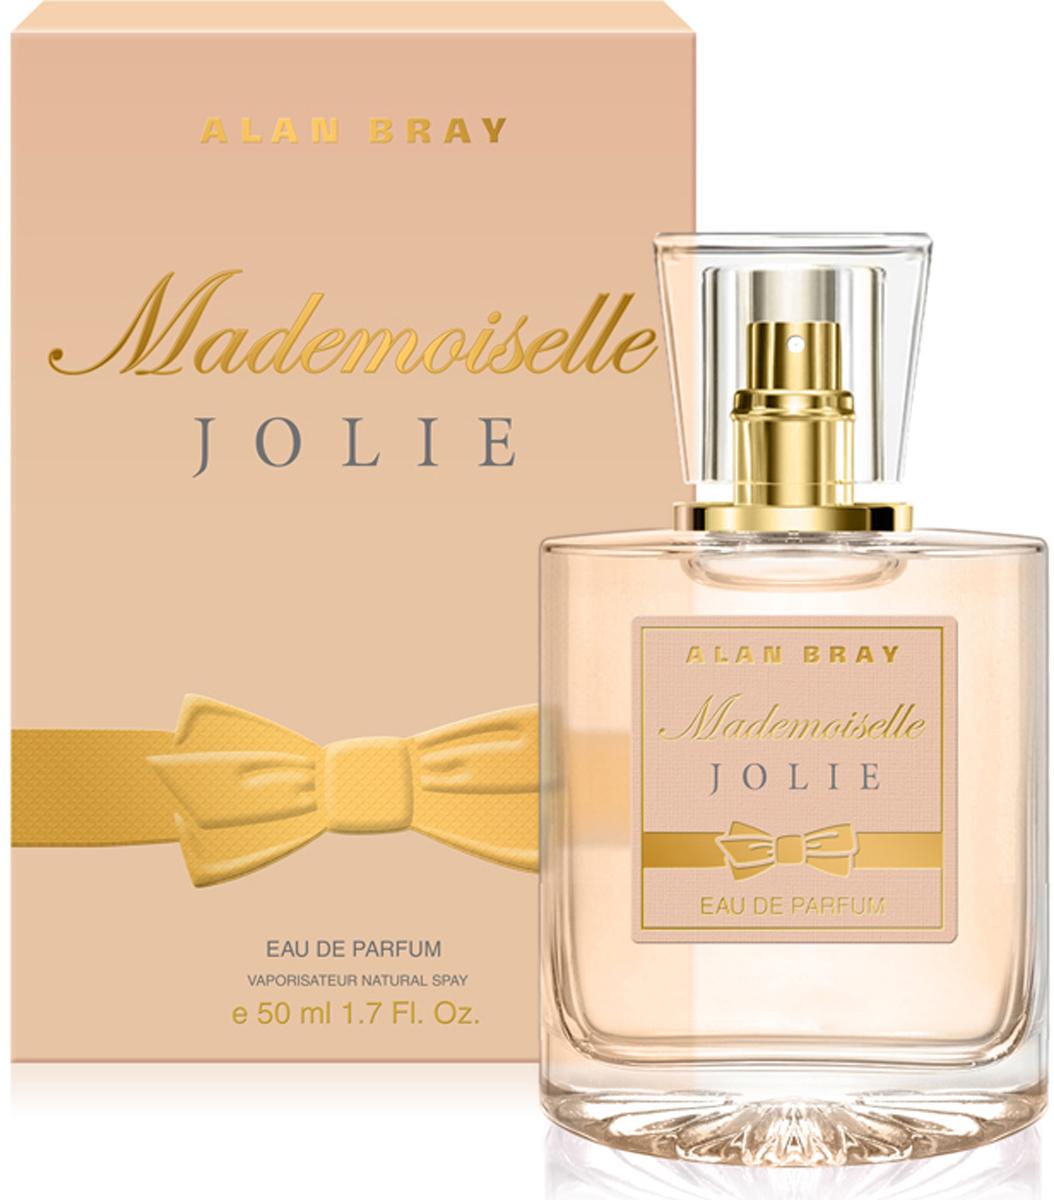 Alan Bray Парфюмерная вода Mademoiselle Jolie, 50 мл серьги mademoiselle jolie paris mademoiselle jolie paris mp002xw13qlo